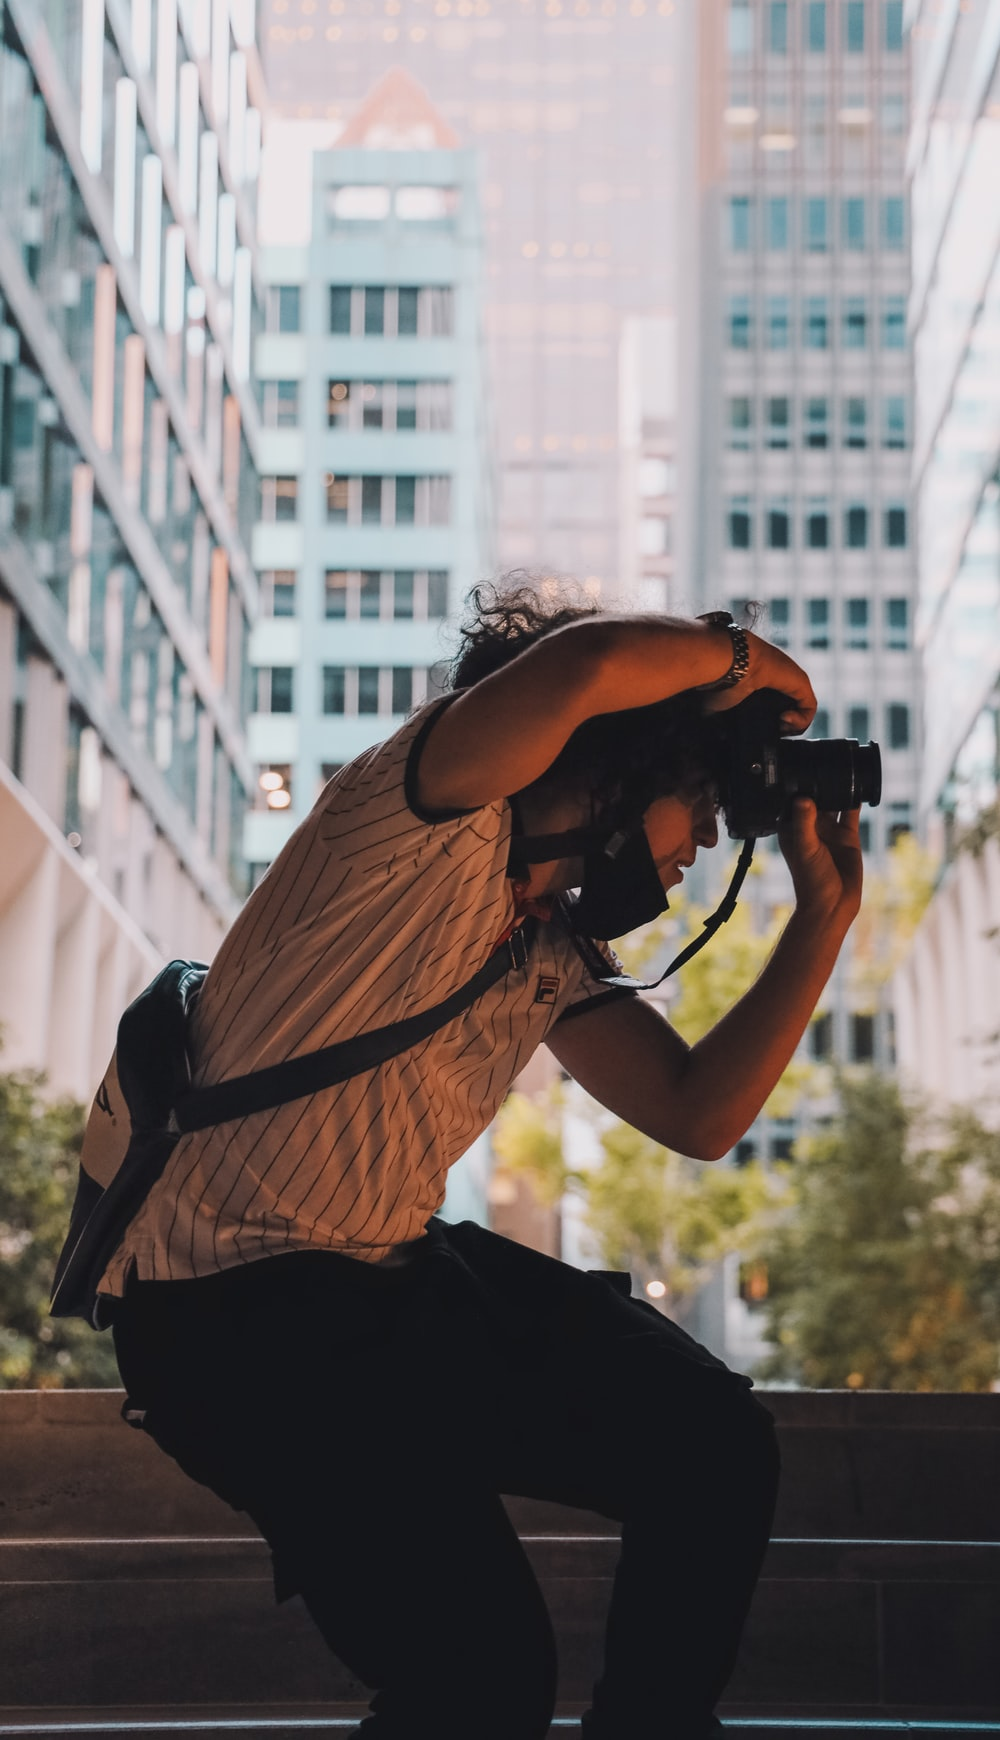 man in brown t-shirt and black pants holding black dslr camera